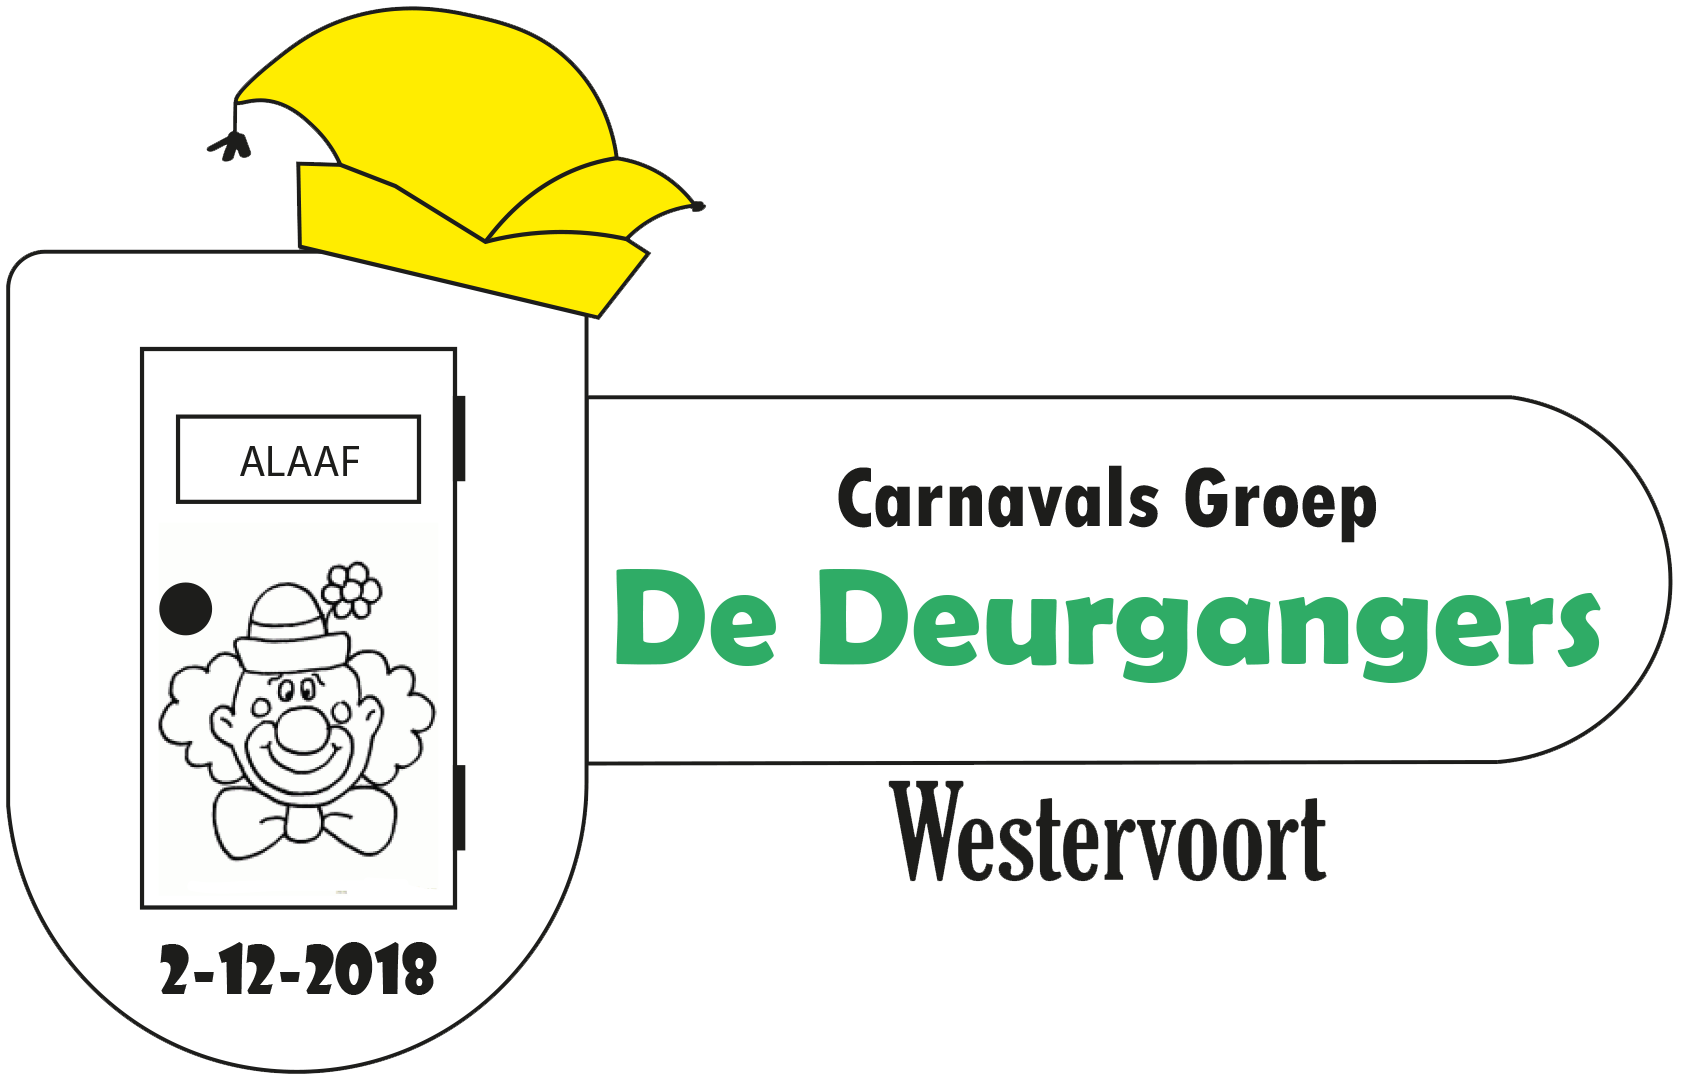 CG De Deurgangers Westervoort